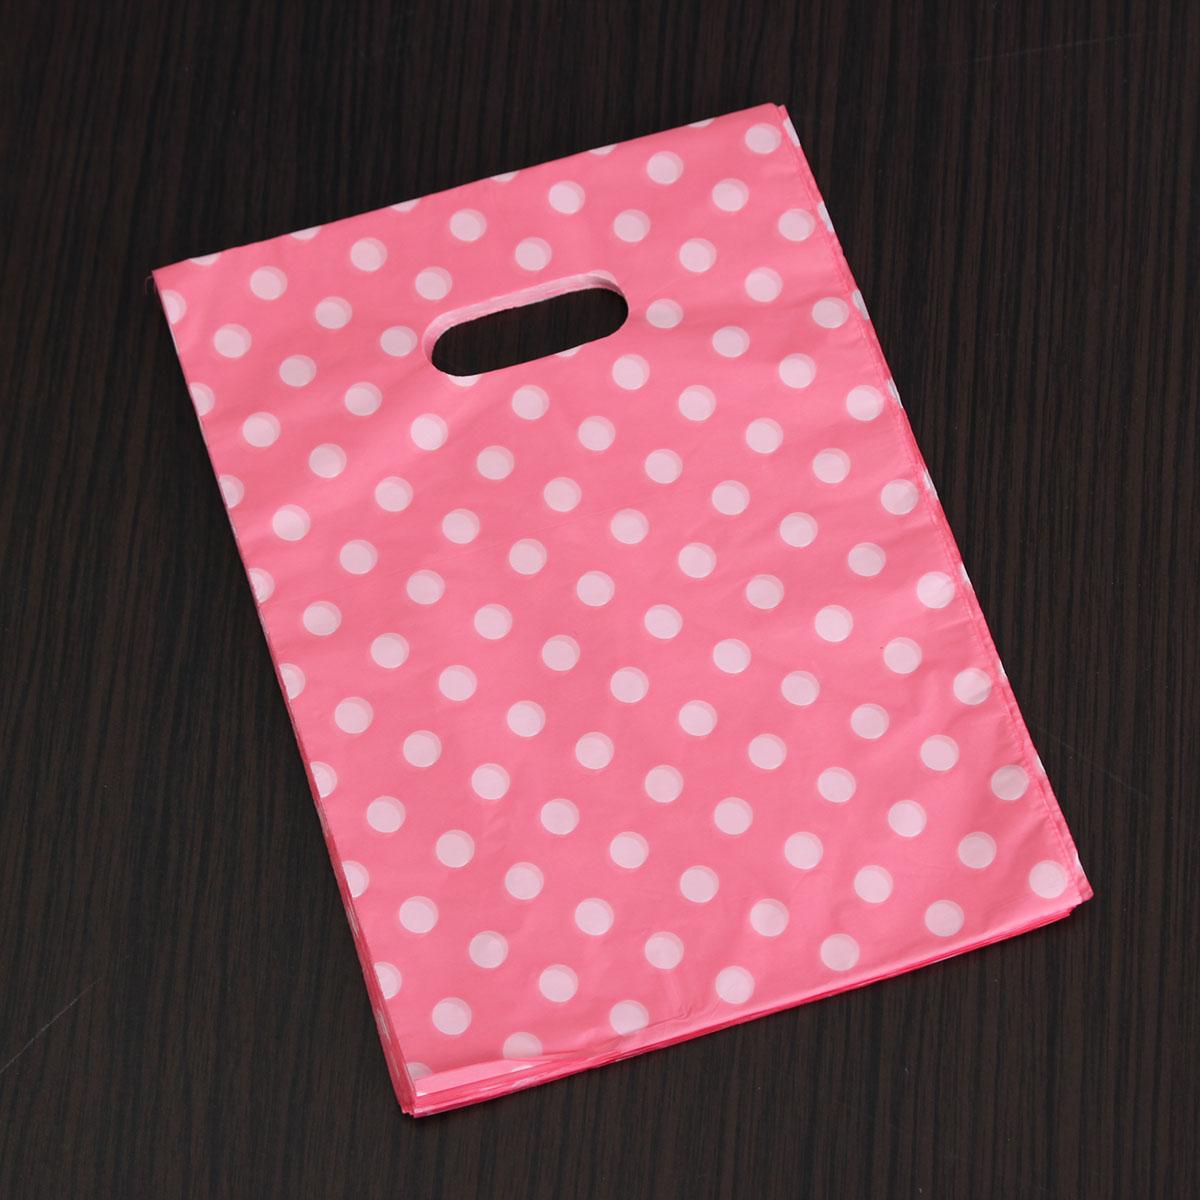 100pcs Pretty Mini Mixed Pattern Plastic Jewelry Gift Bag Shopping Pouch 20*15CM